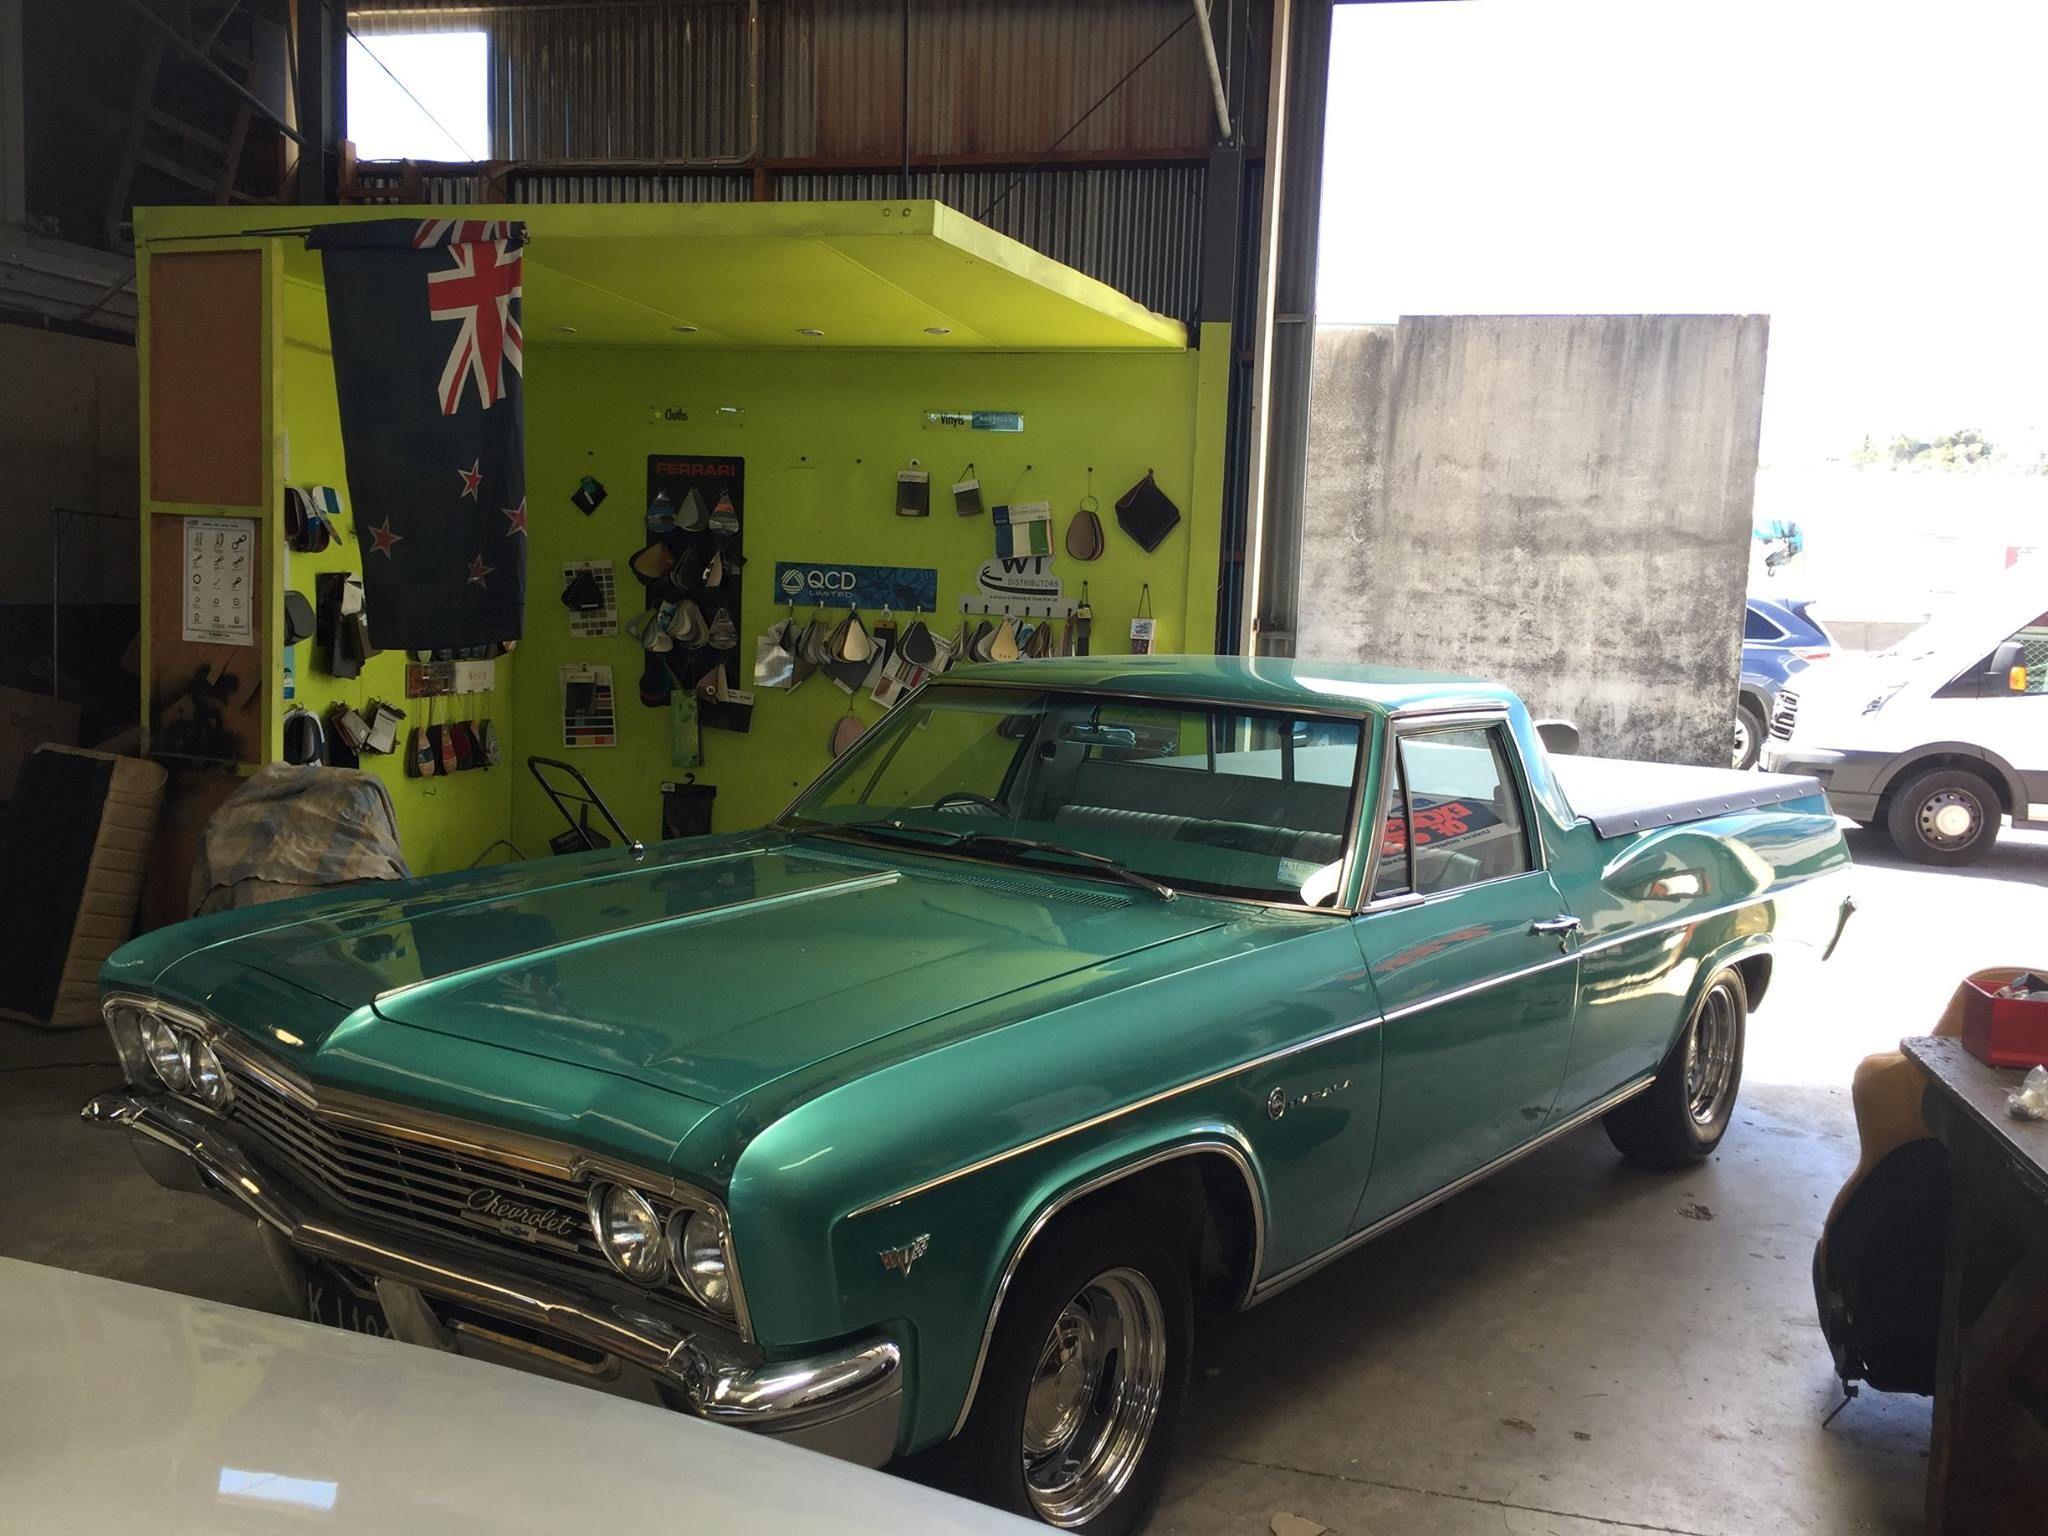 1966 Chev Bel Air Ute Converted In New Zealand Pickup Car Bel